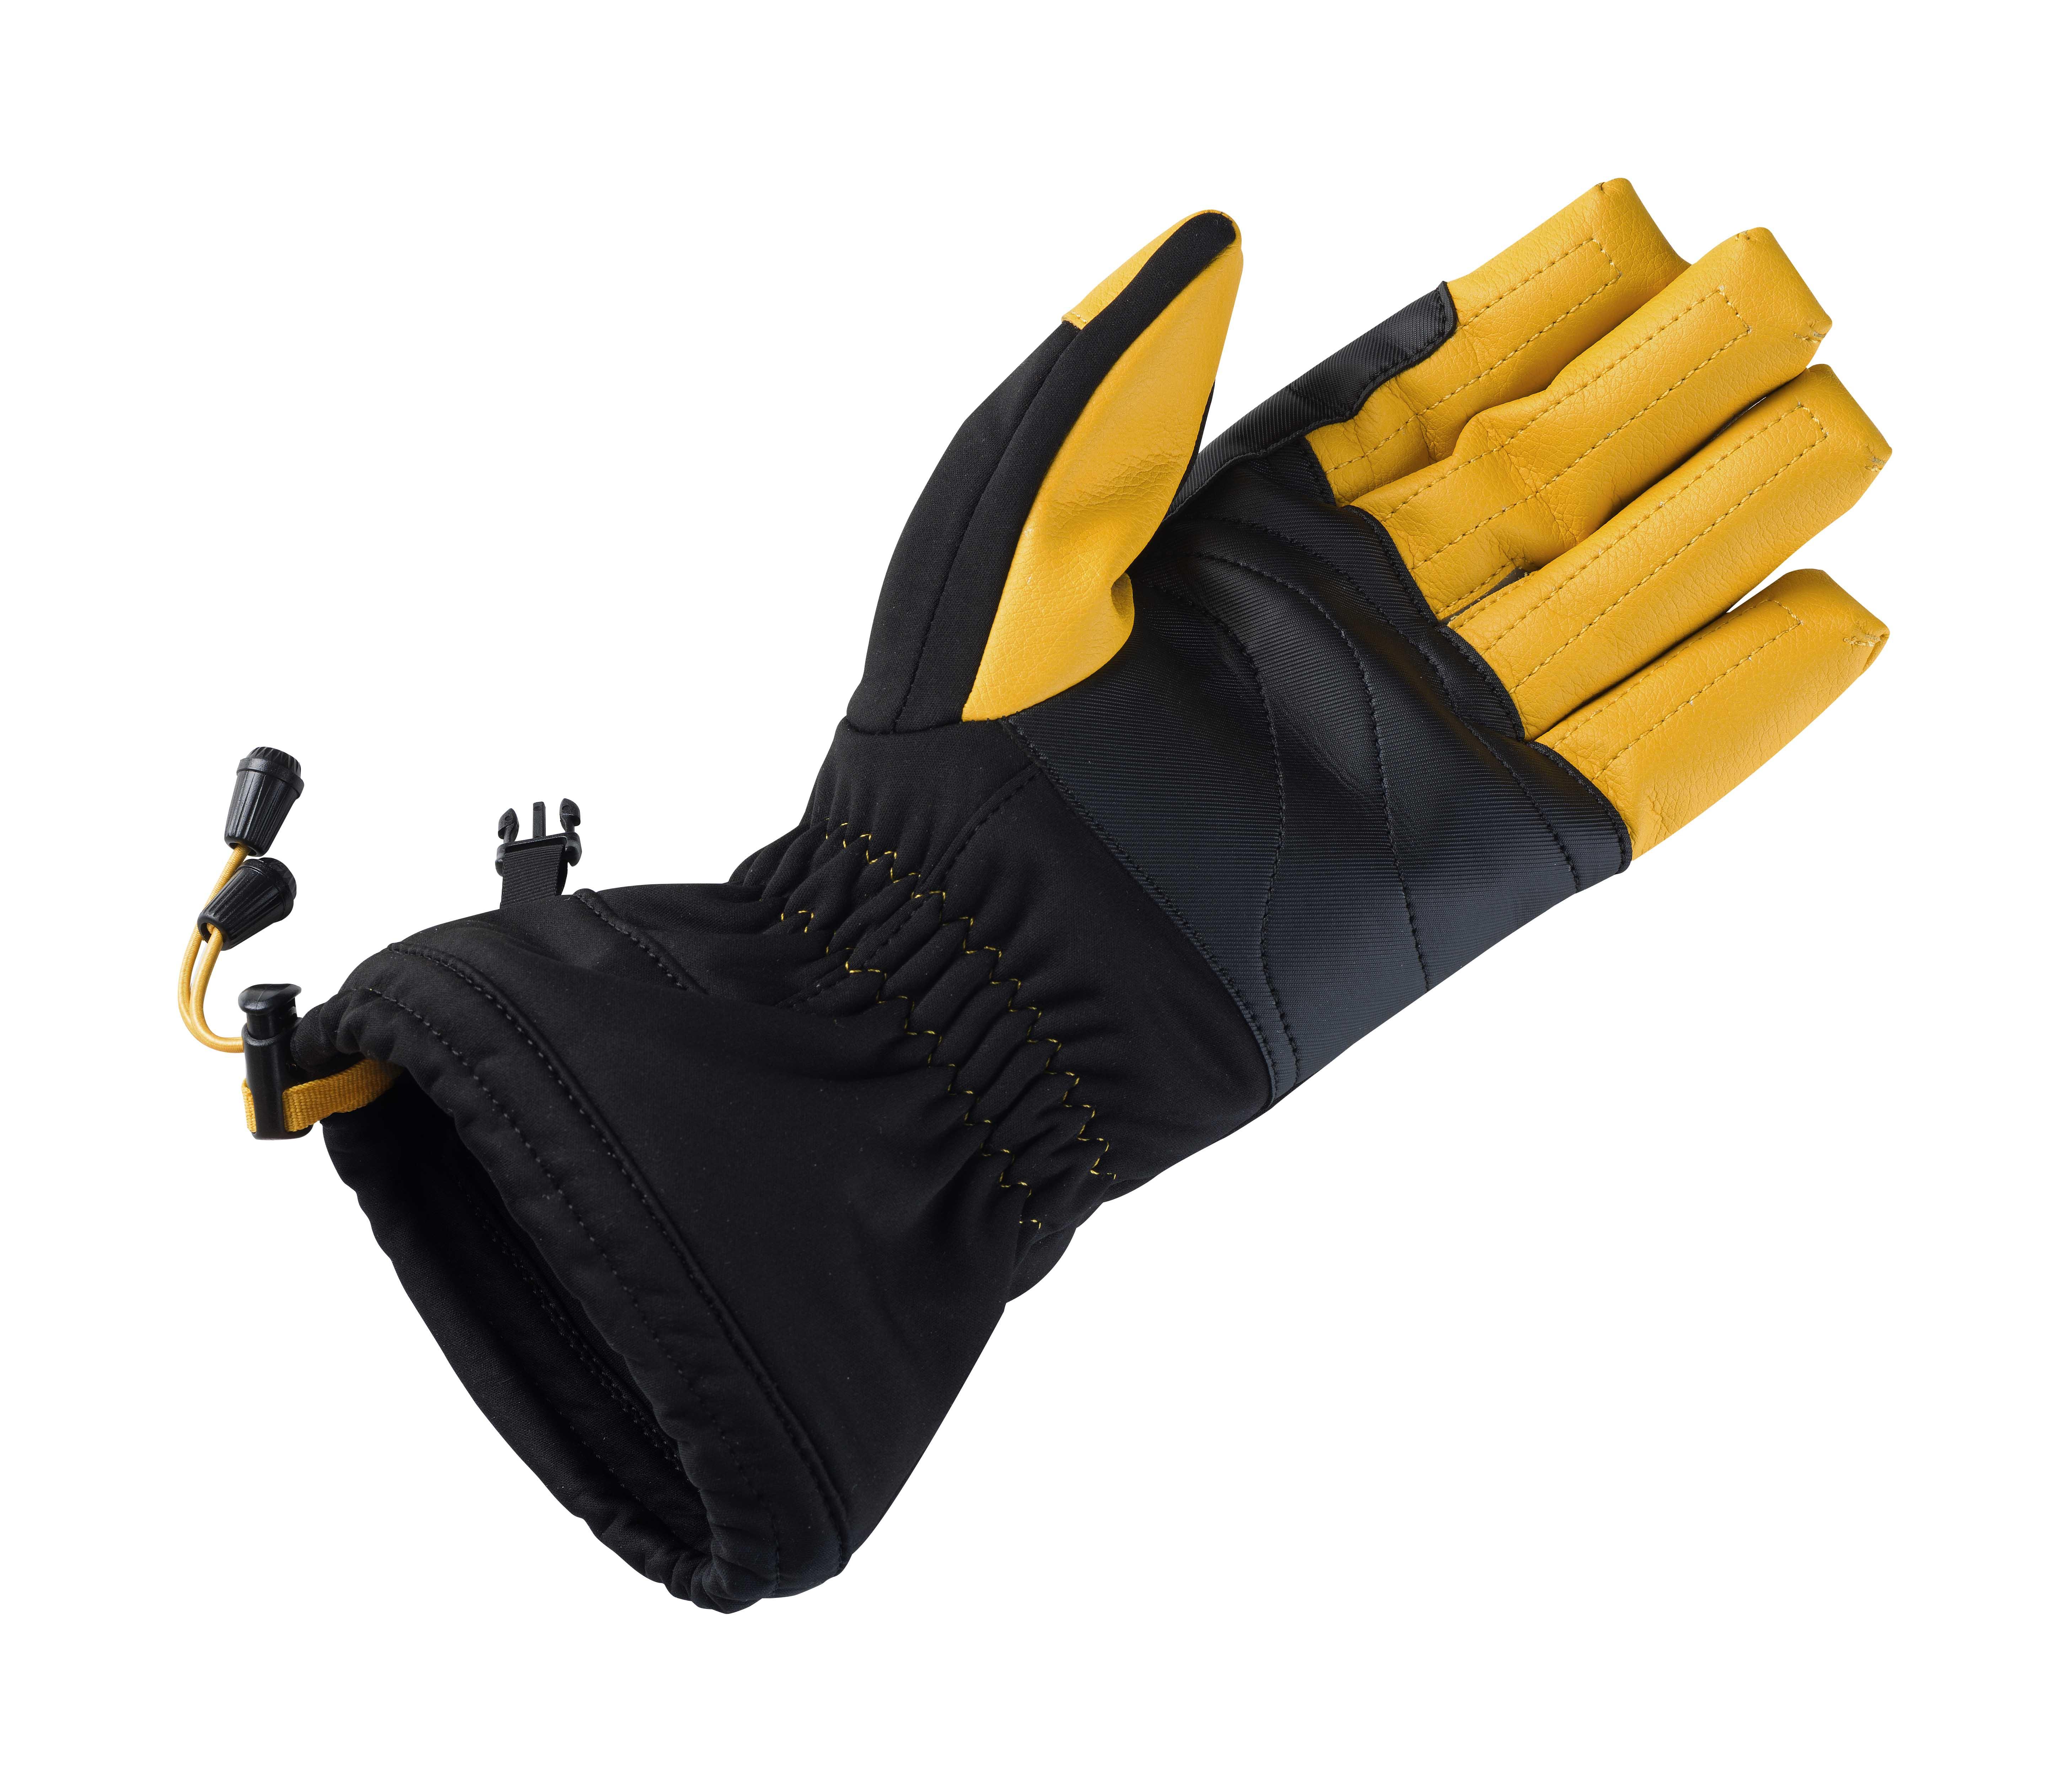 Schwarz Handschuhe Gill Helmsman Segelhandschuhe 2018 Bekleidung